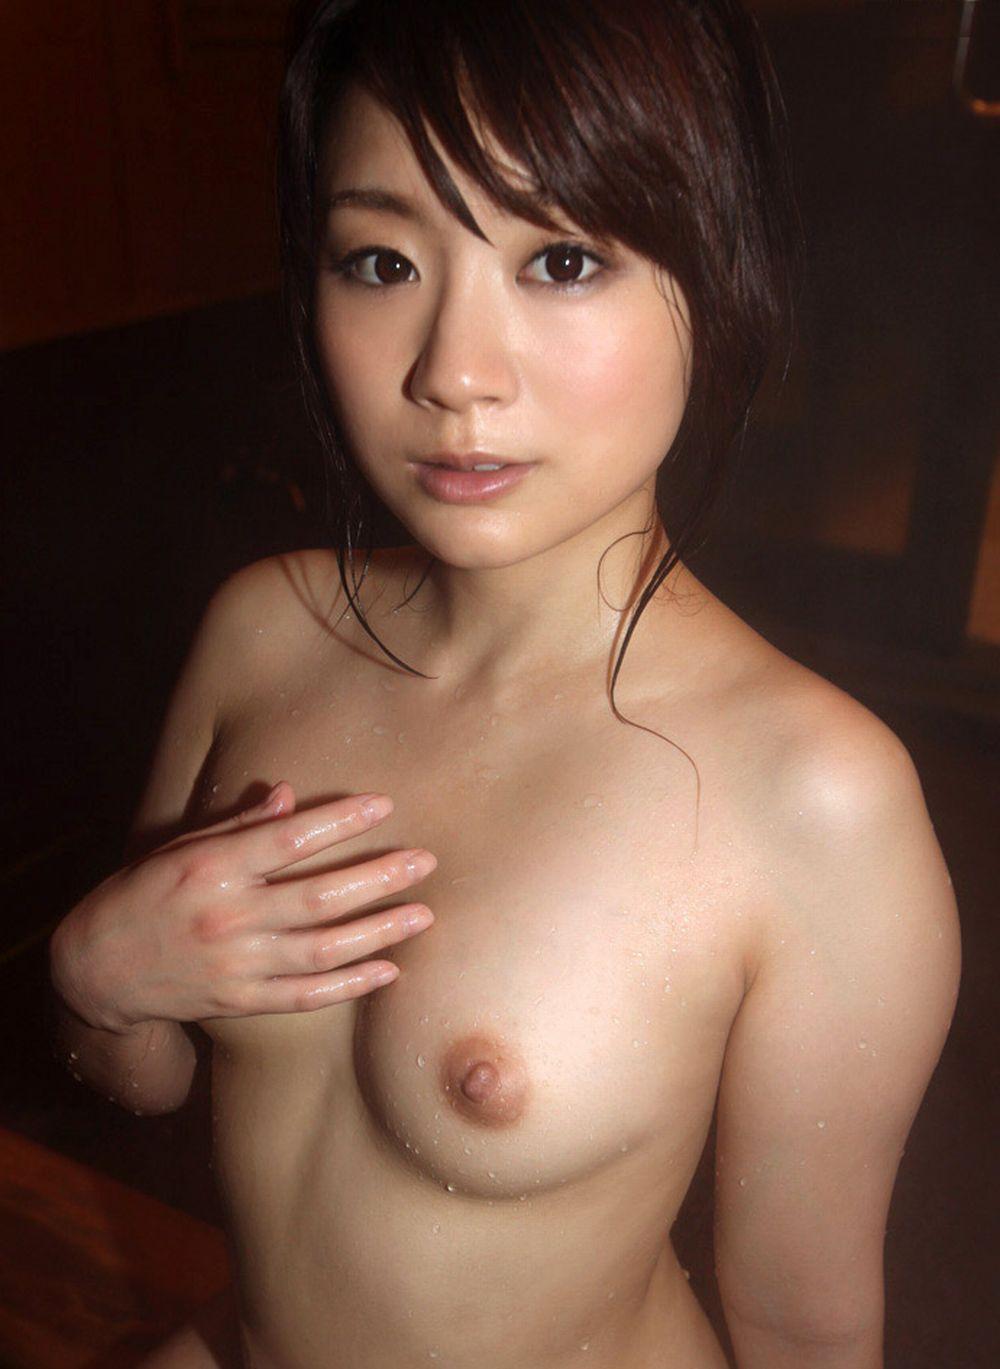 AV女優のエロ画像 26